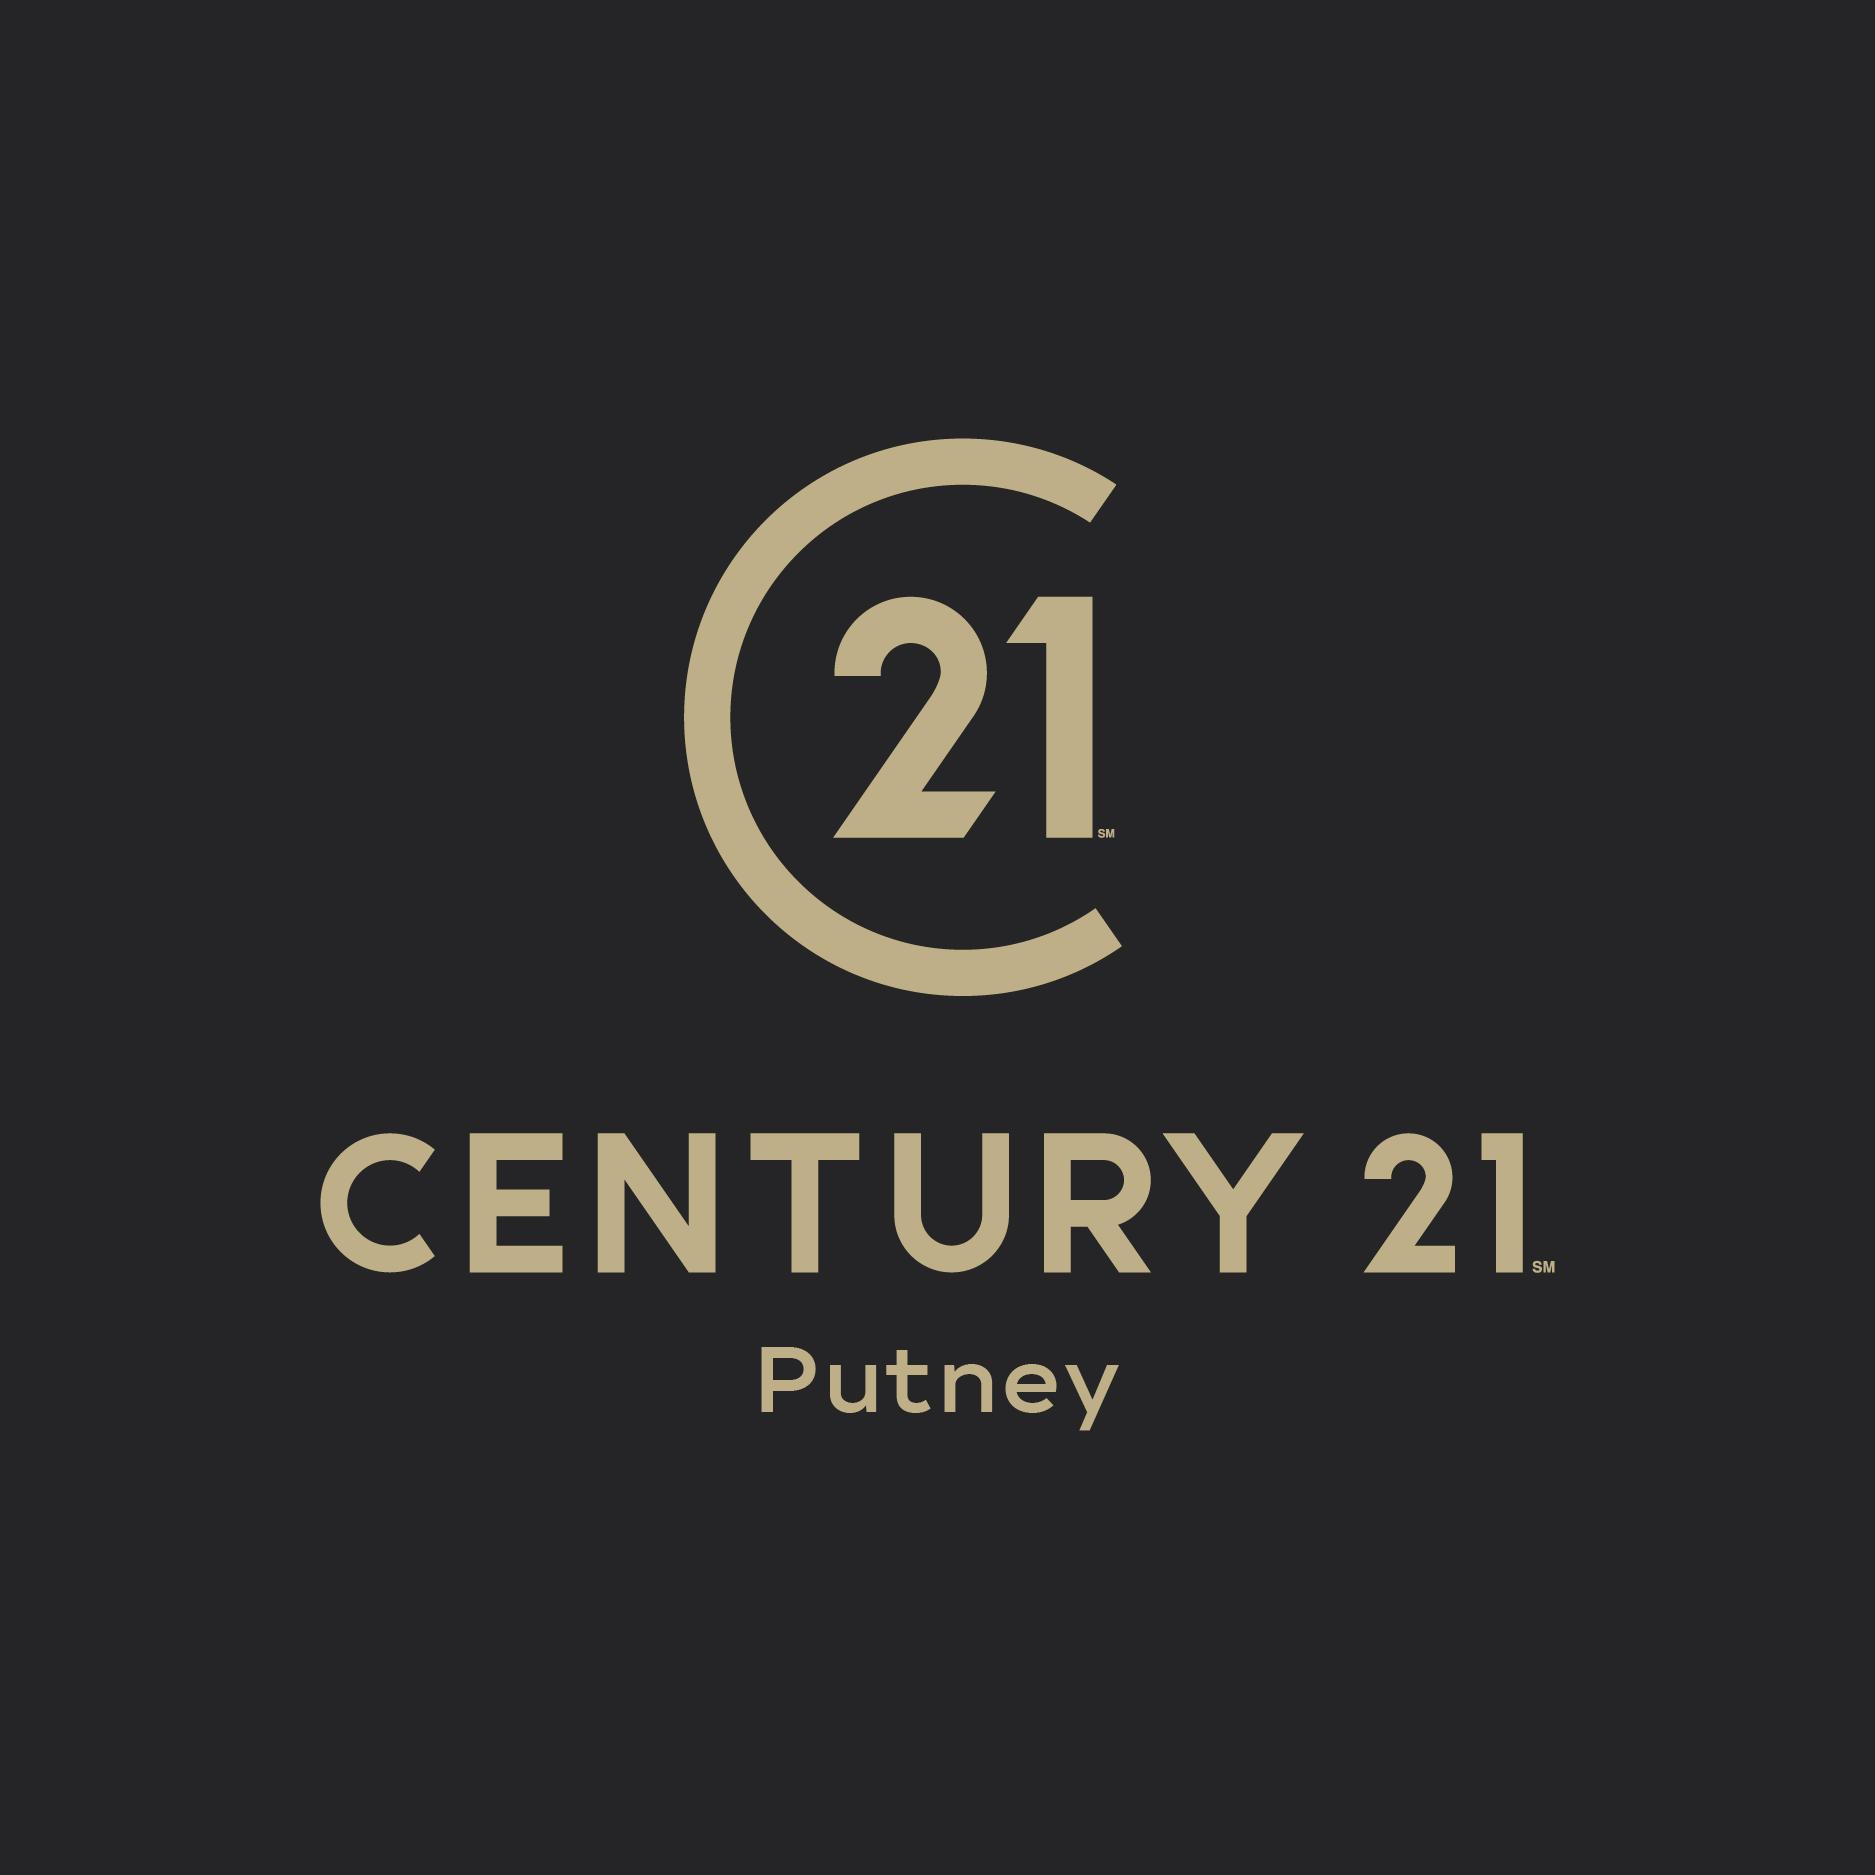 Century 21 - Putney